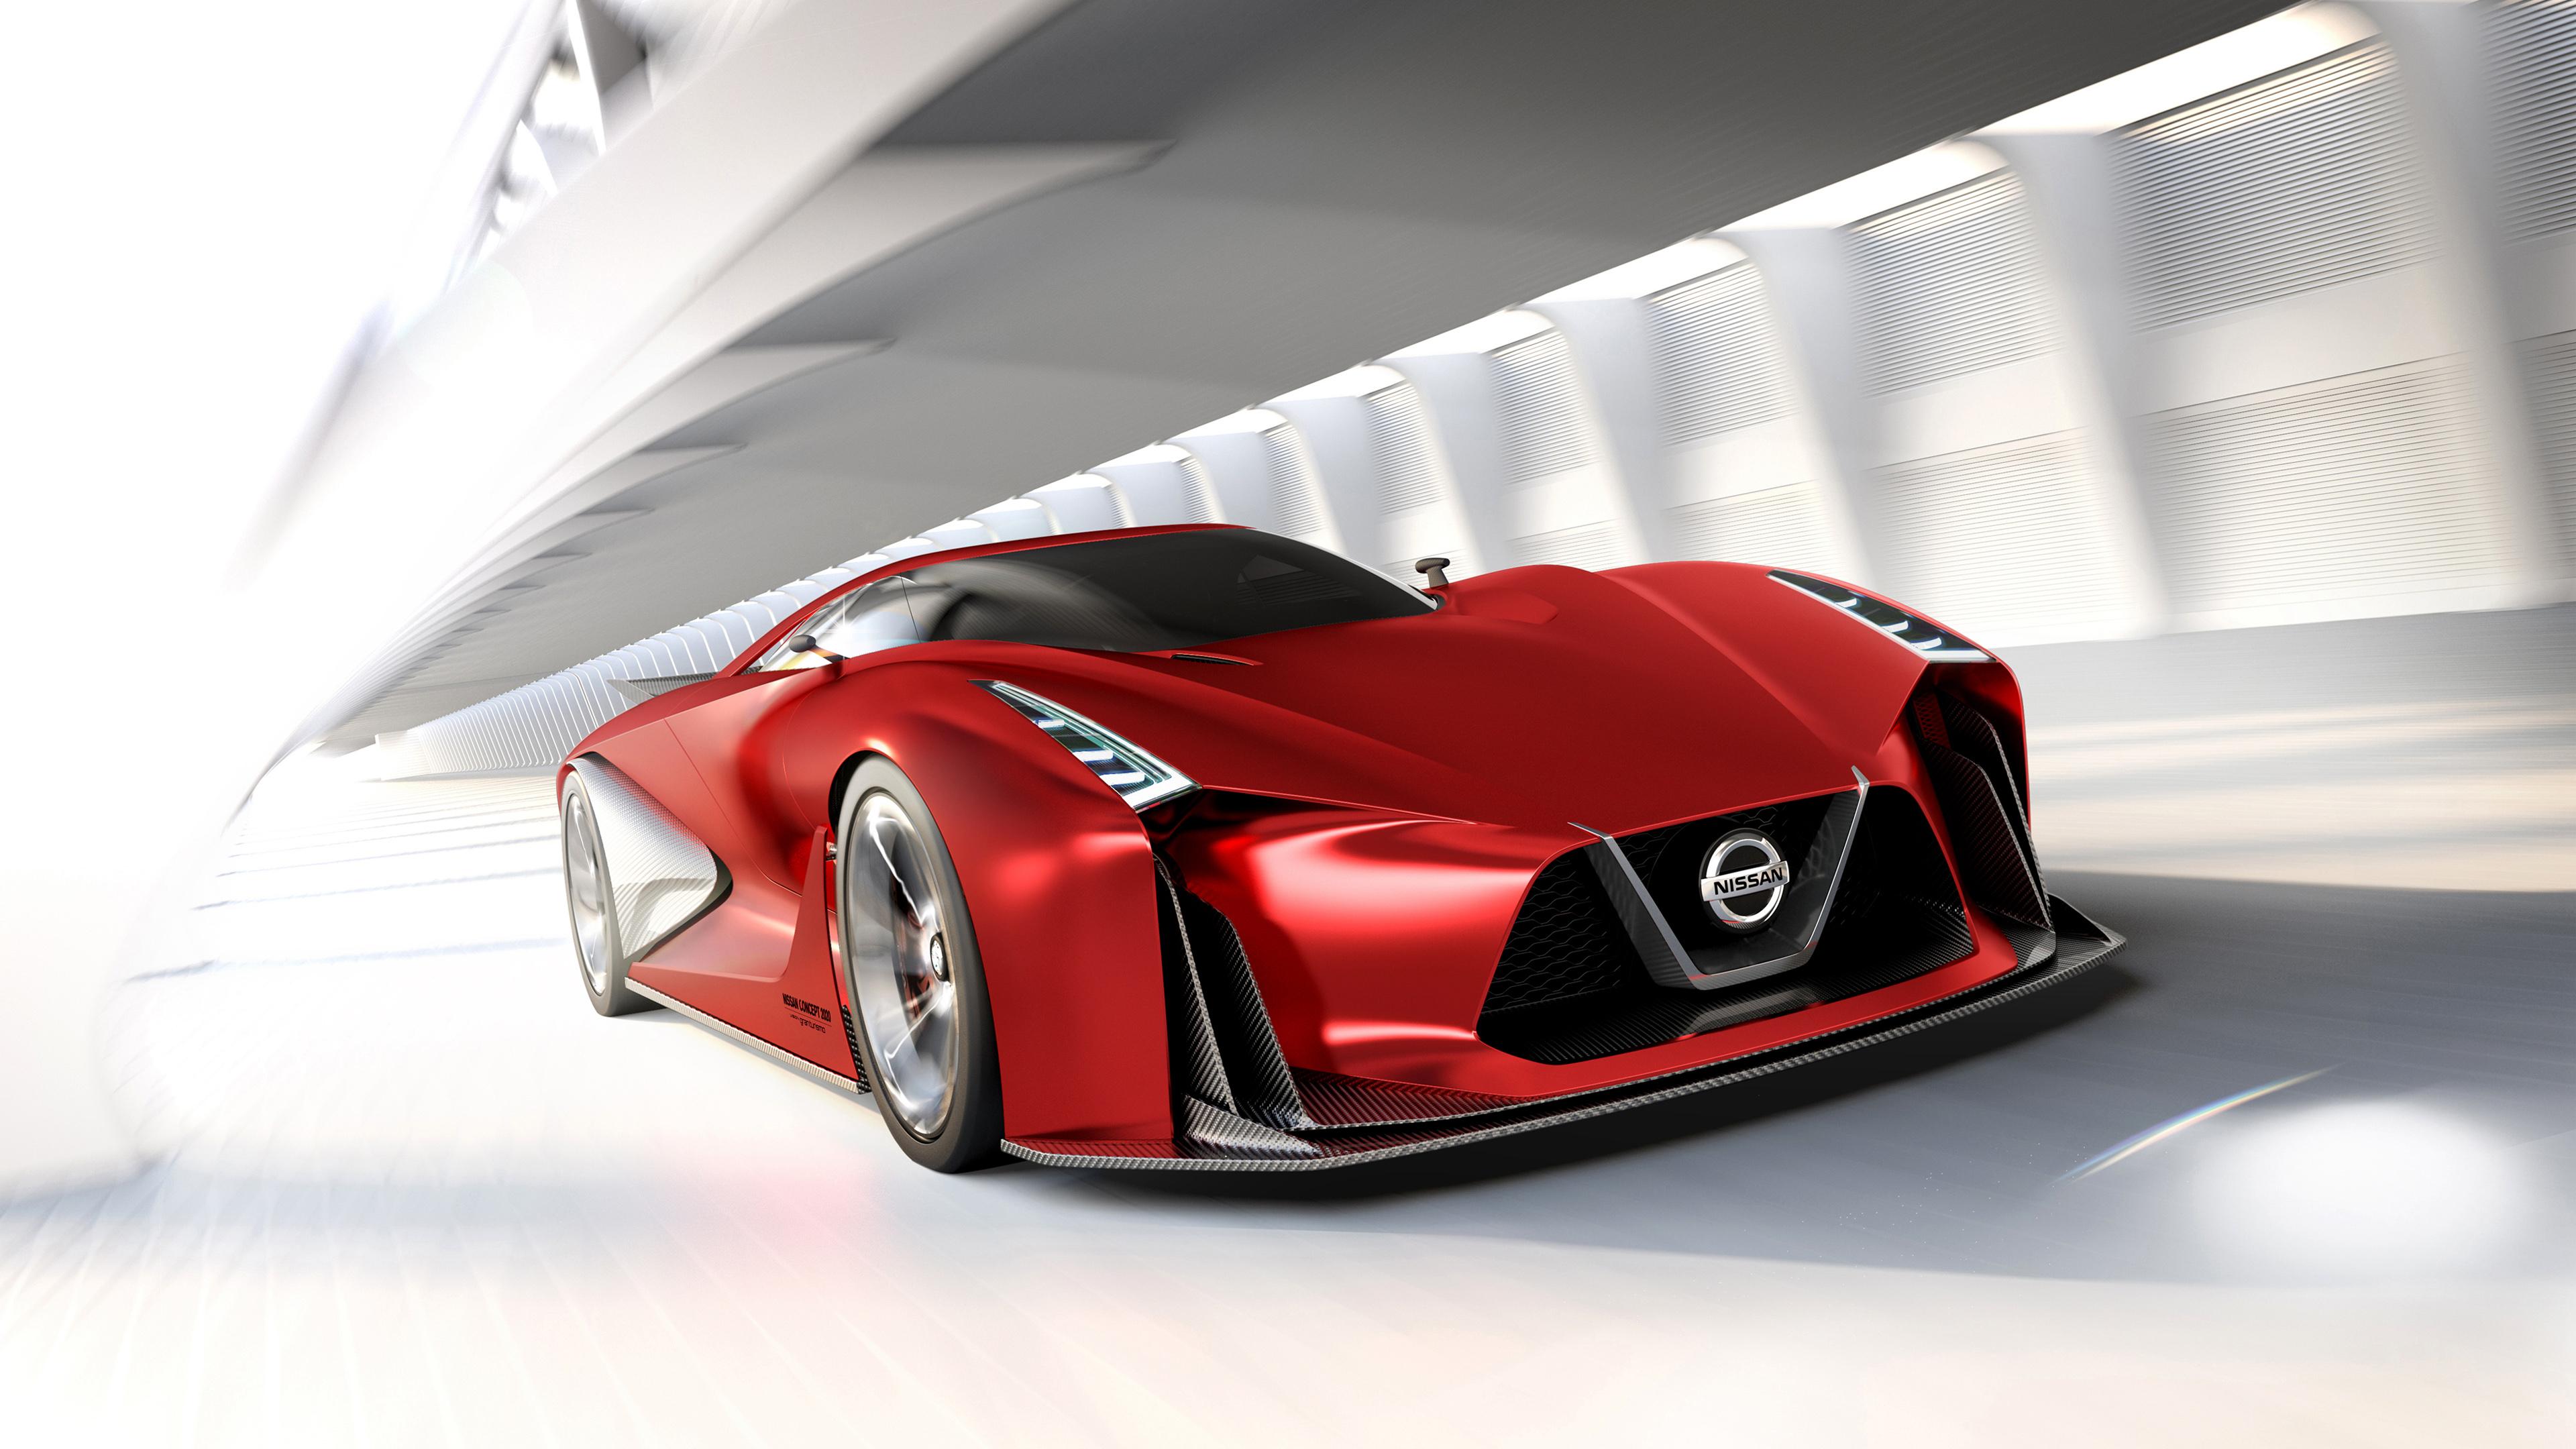 Nissan Concept 2020 Vision Gran Turismo 2 Wallpaper   HD ...